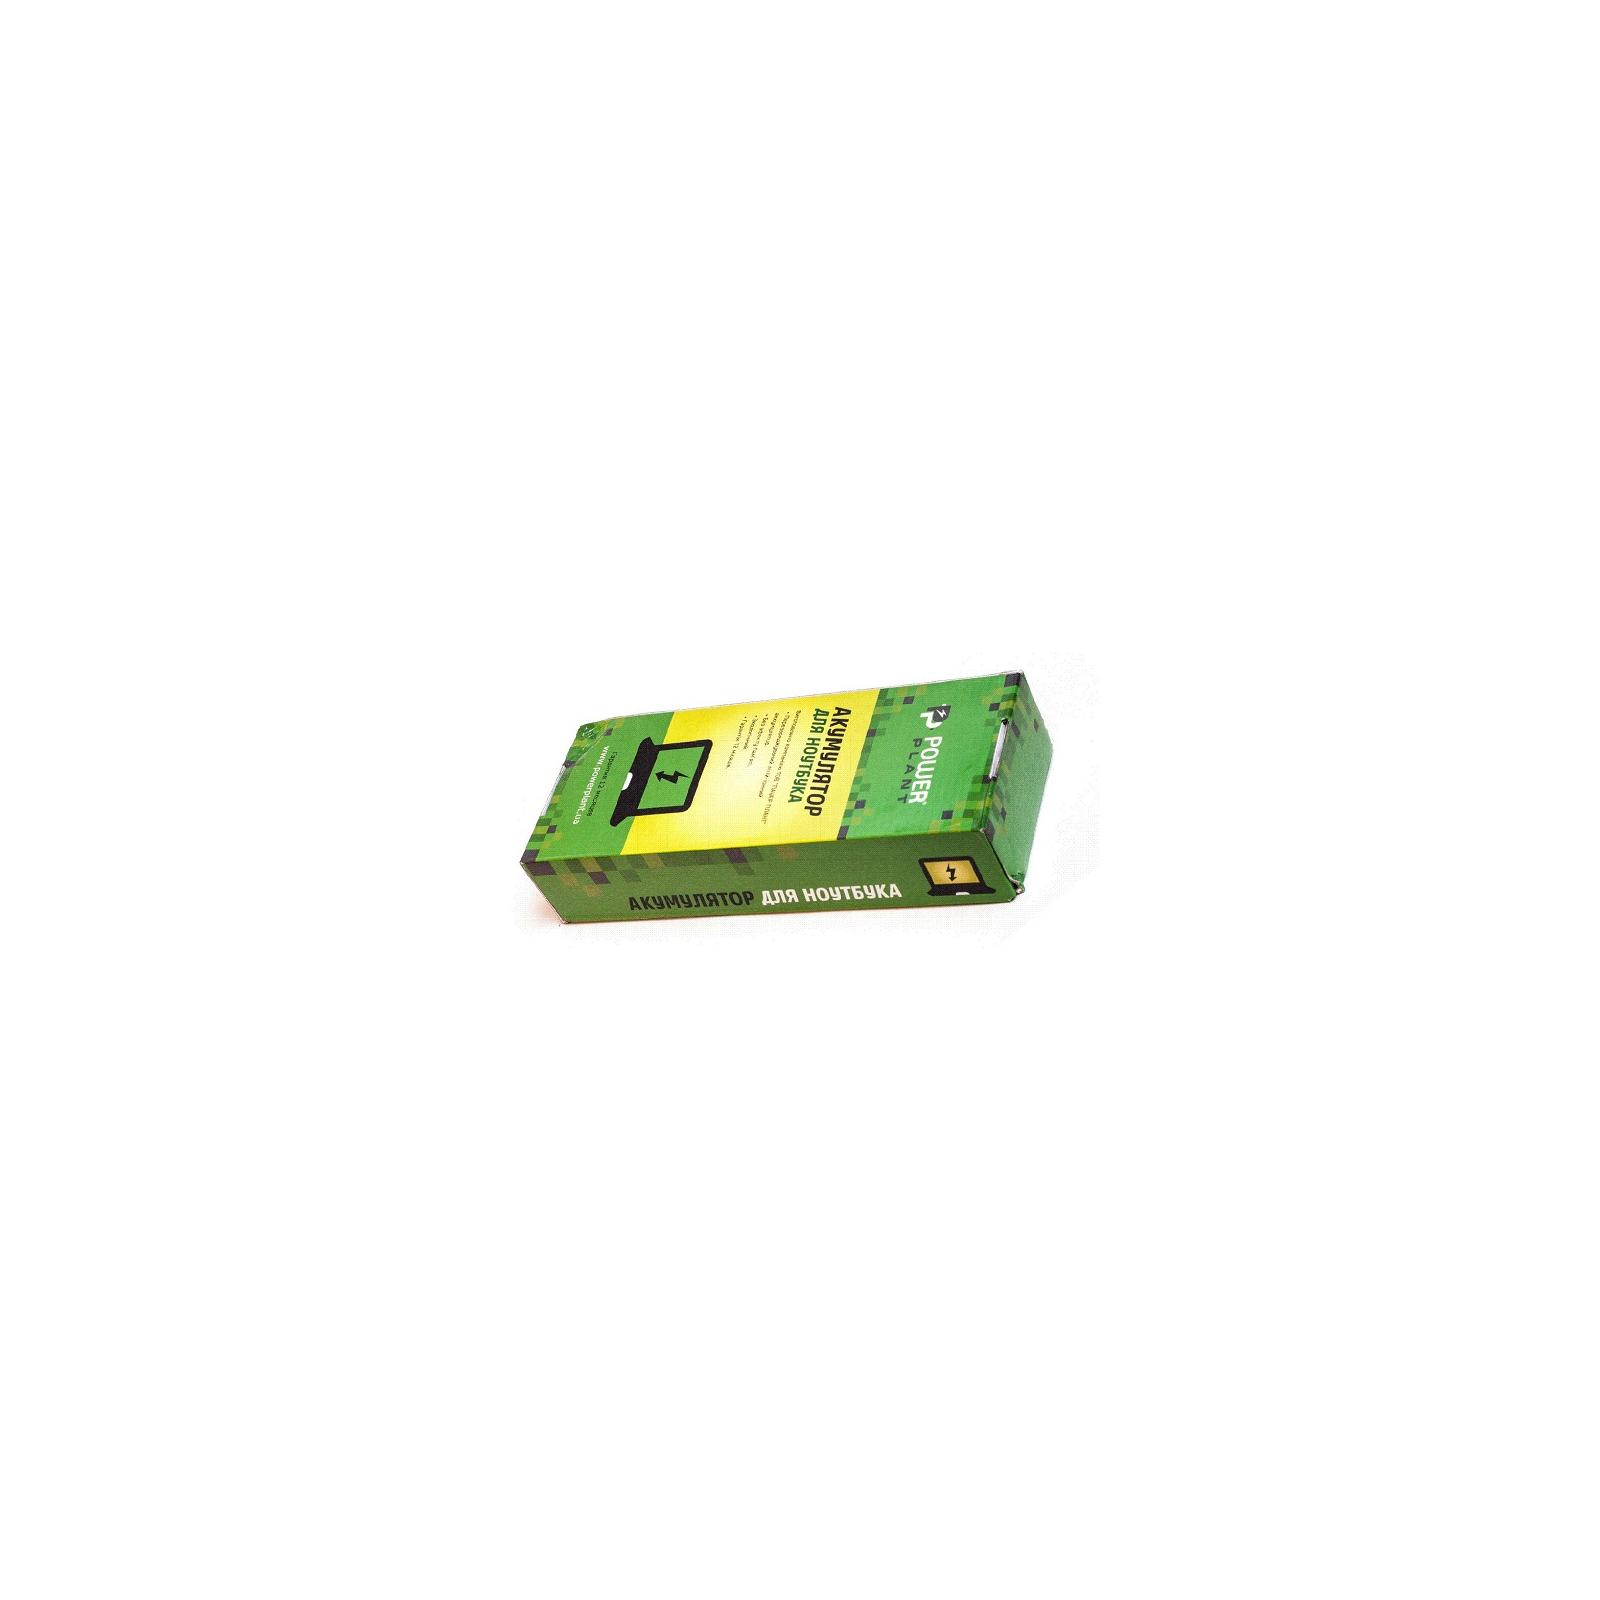 Аккумулятор для ноутбука LENOVO S10 (L08C3B21, LO8322LH) 11.1V 5200mAh PowerPlant (NB00000131) изображение 3